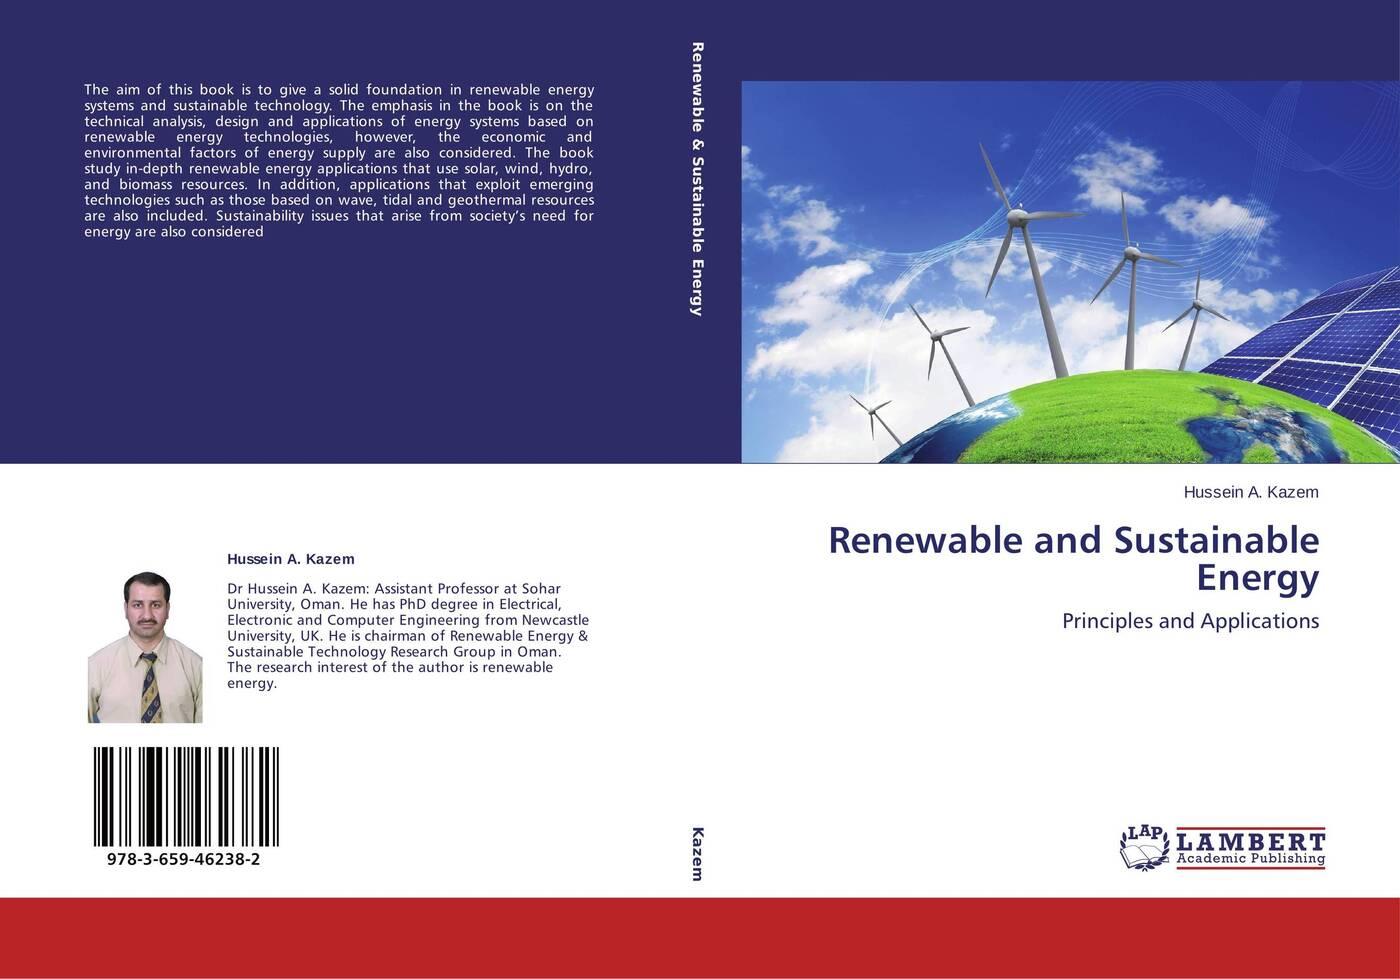 лучшая цена Hussein A. Kazem Renewable and Sustainable Energy